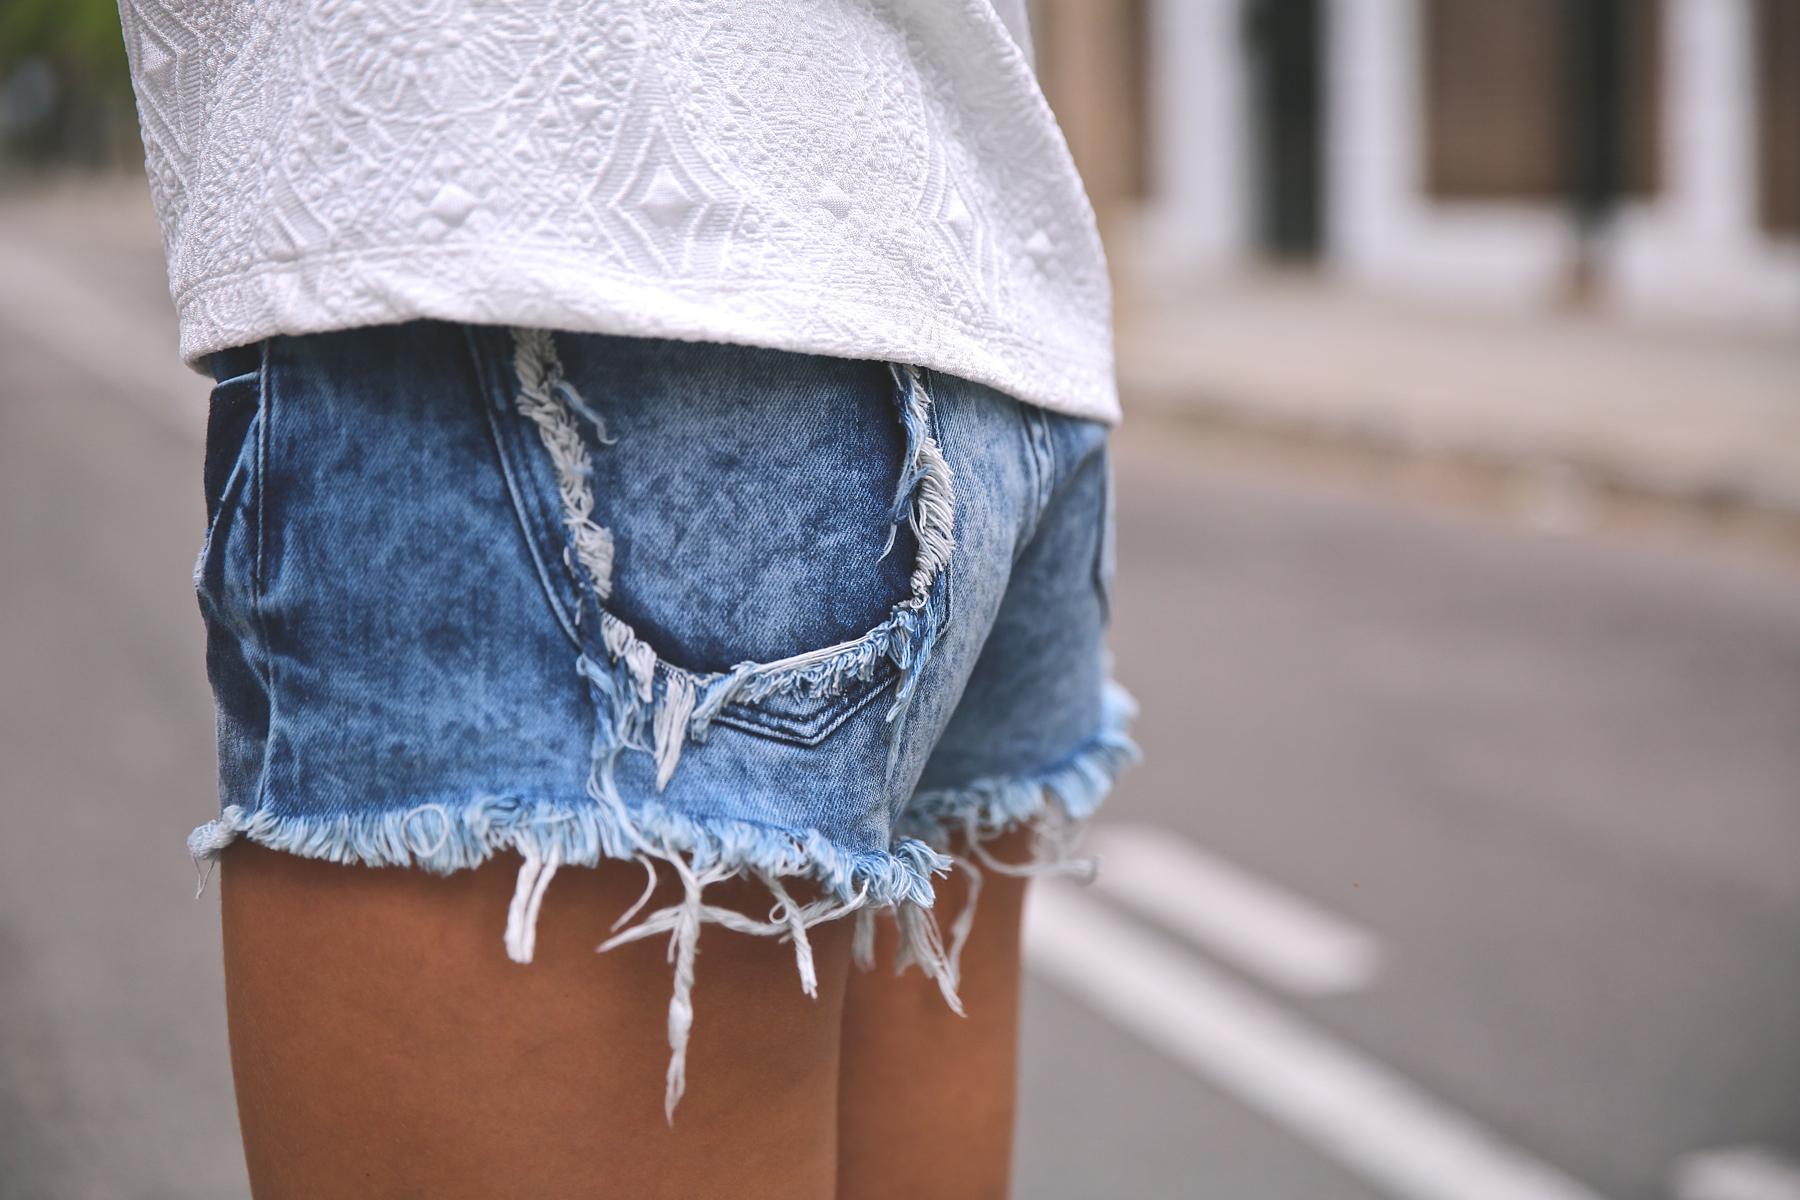 trendy_taste-look-outfit-street_style-ootd-blog-blogger-fashion_spain-moda_españa-denim_shorts-shorts_vaqueros-top_blanco-white_top-sandalias_cordones-ethnic_cluth-clutch_etnico-el_corte_ingles-2